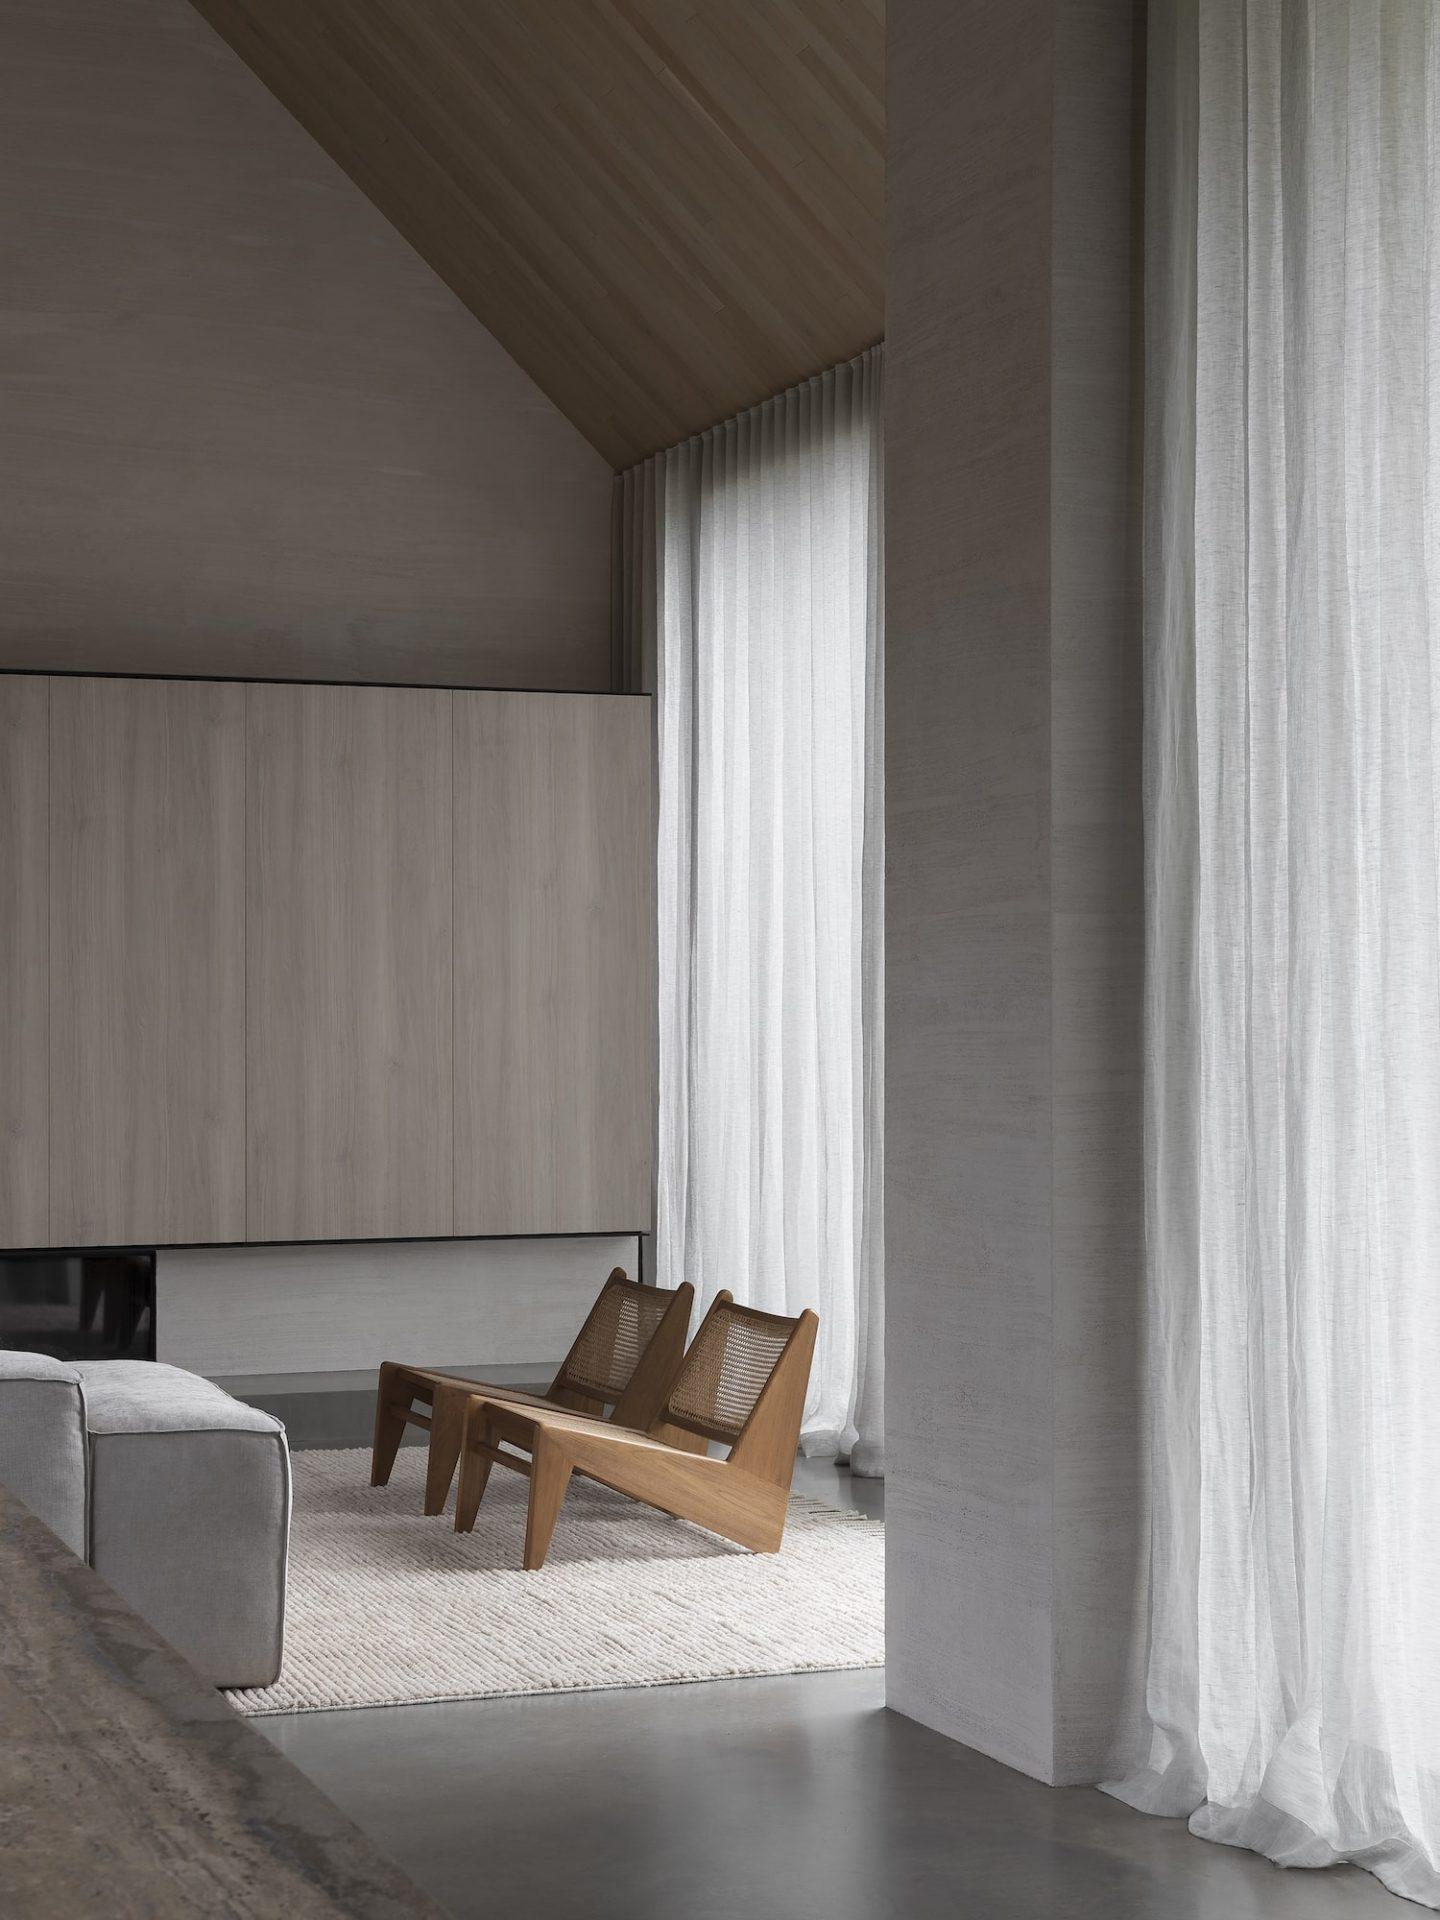 IGNANT-Architecture-Adam-Kane-Barwon-Heads-010-min